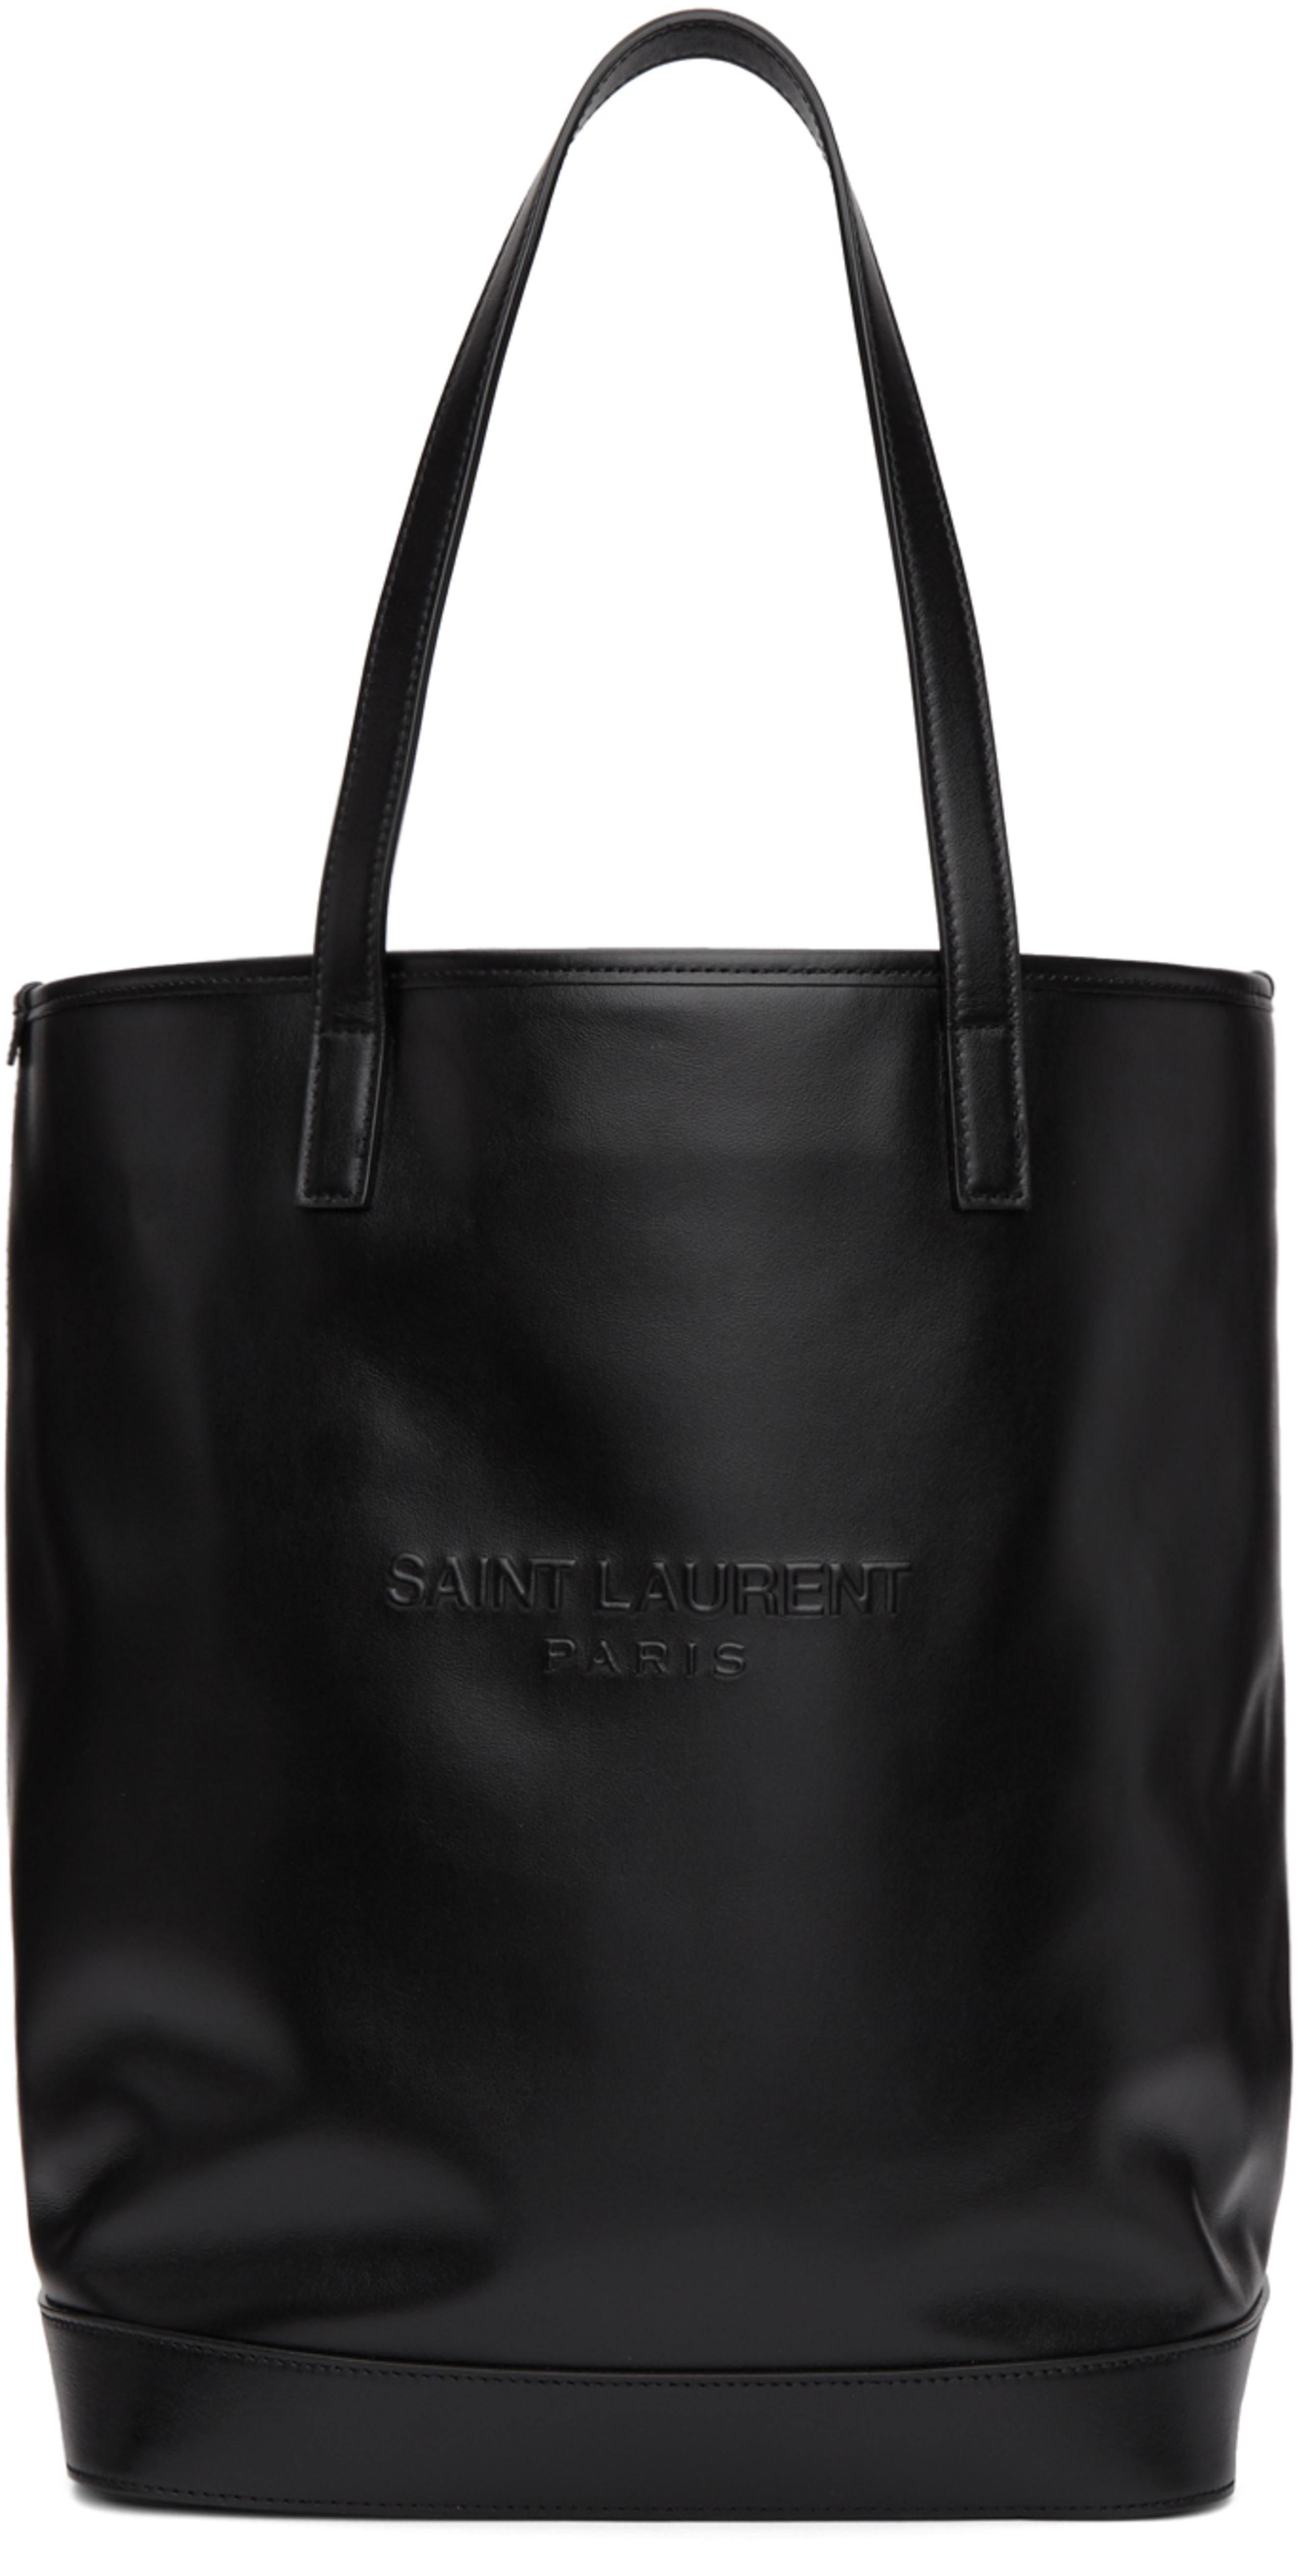 a81669fed4 Saint Laurent bags for Women